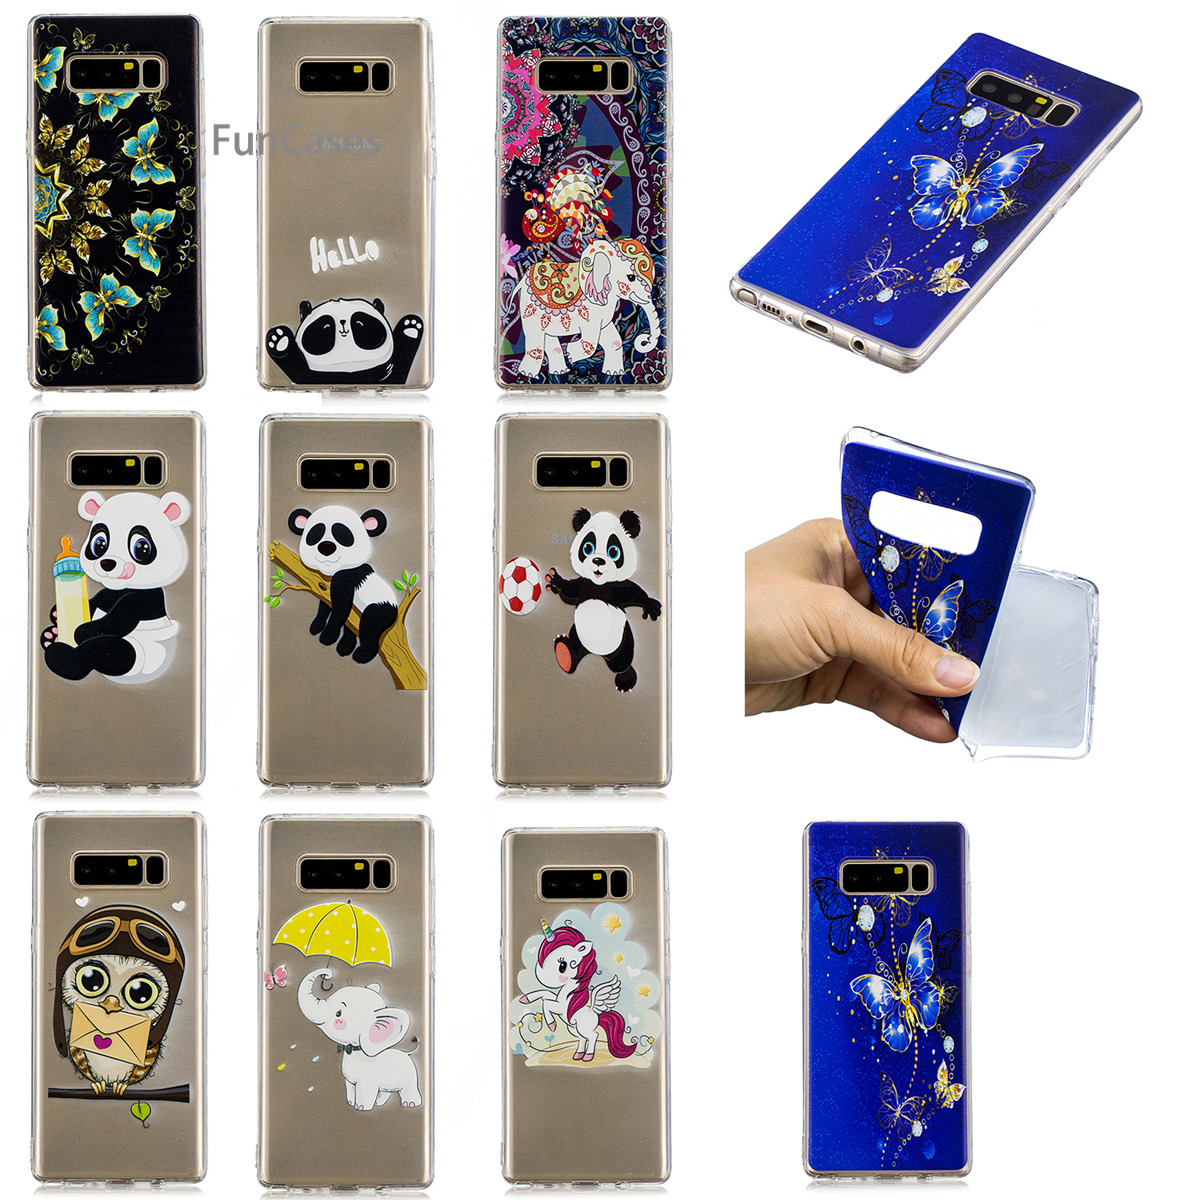 Sports Bottle Phone Case: Feeding Bottle Phone Case SFor Cellular Samsung Note 8